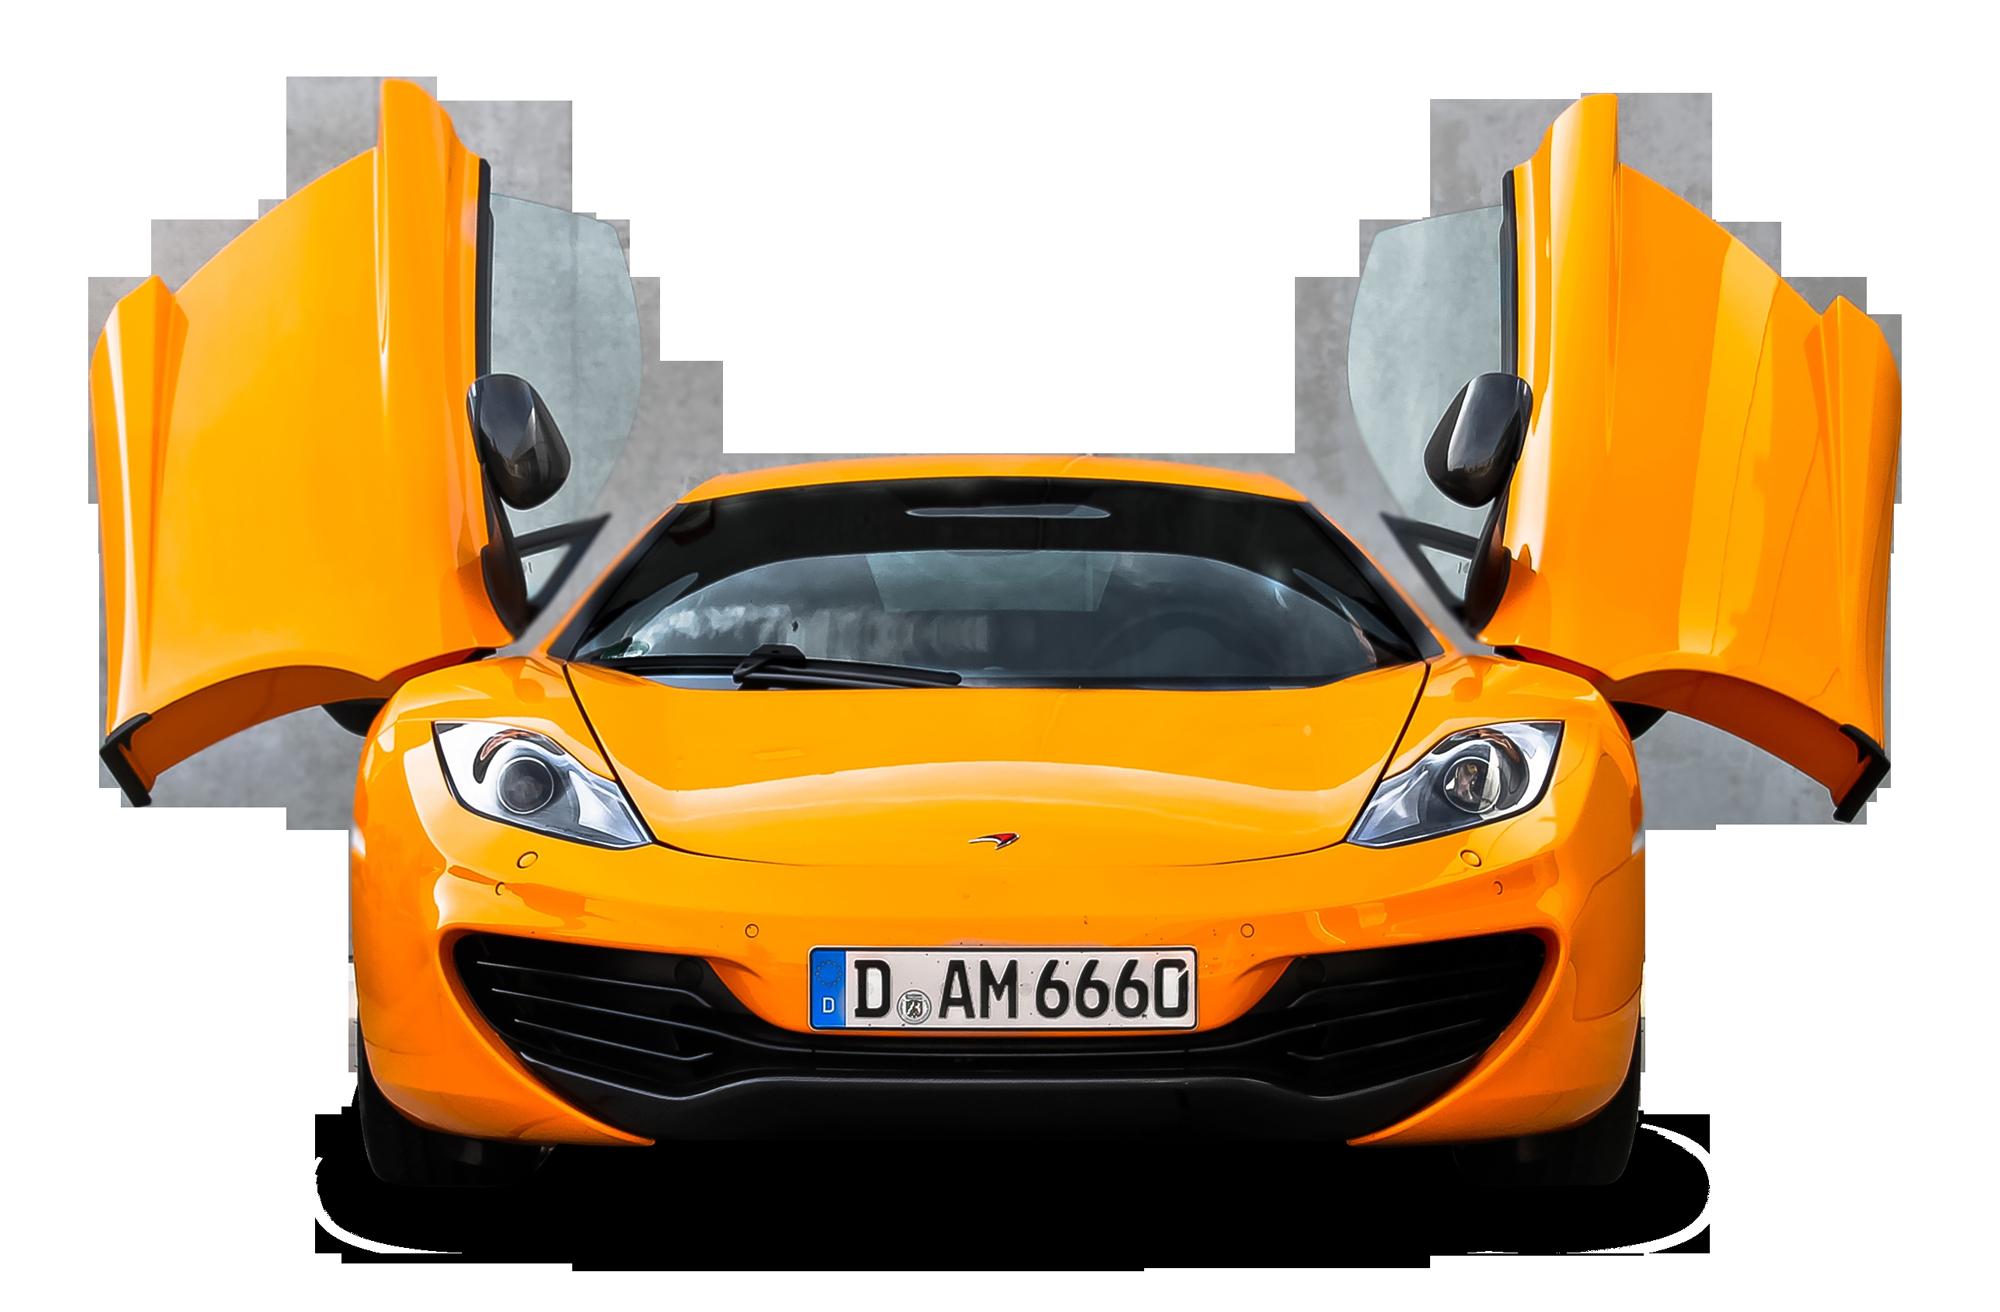 Orange McLaren 12C Front View Car